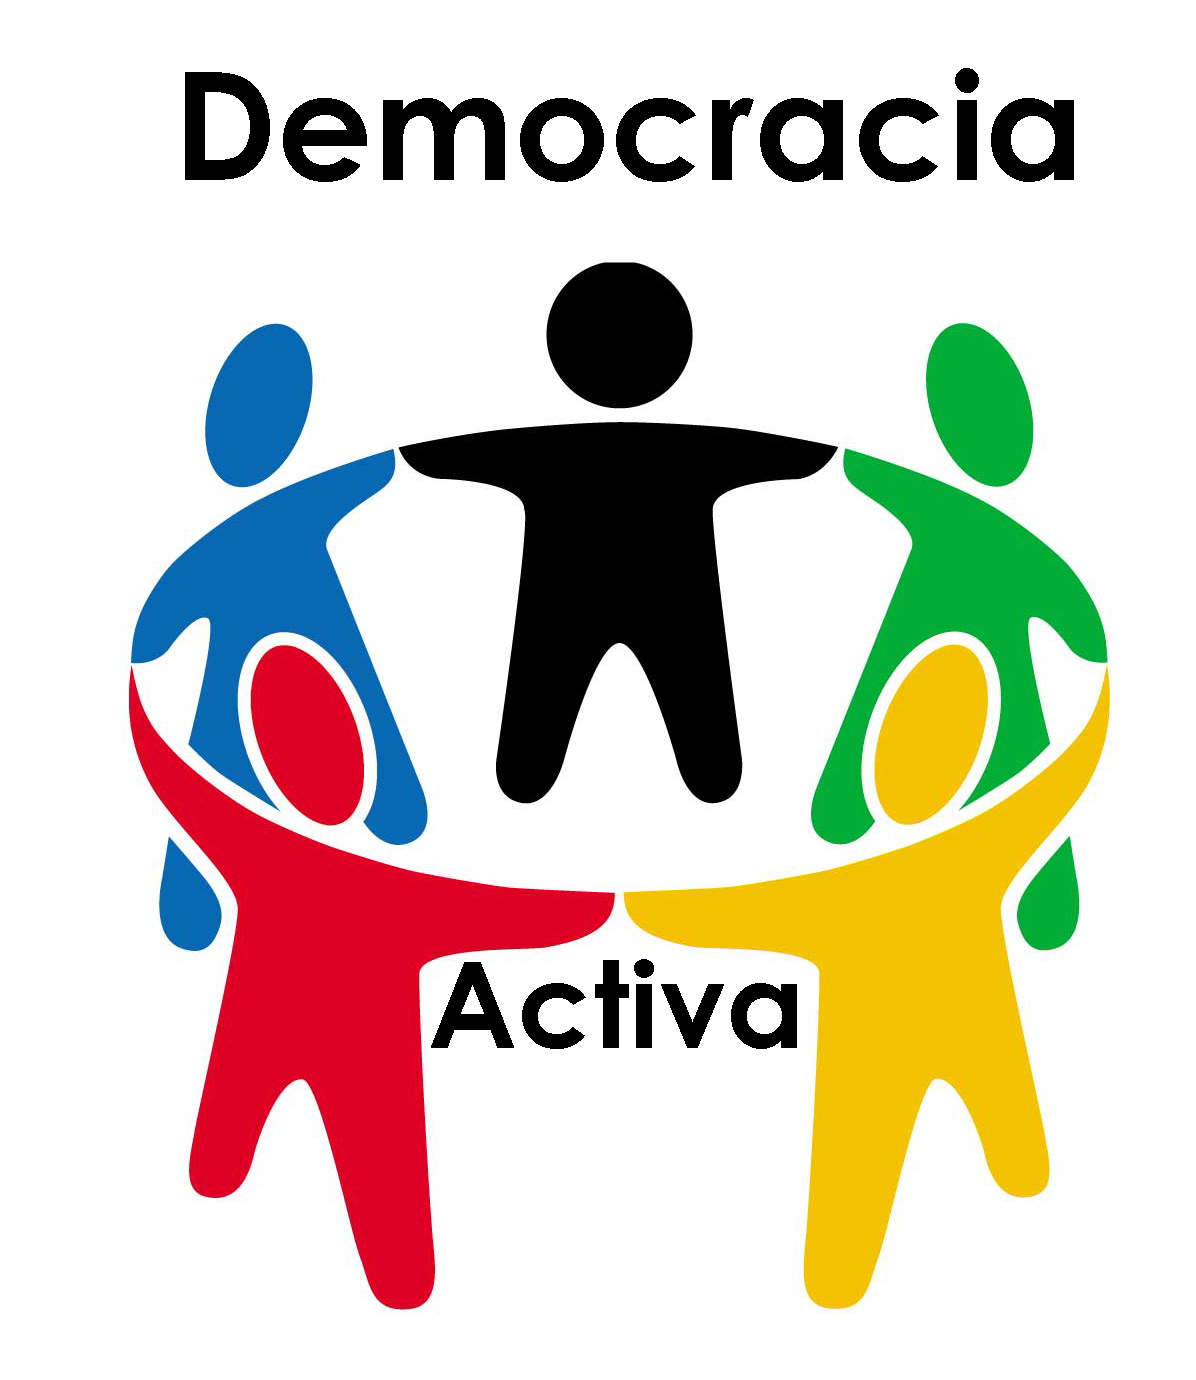 teoria democracia: